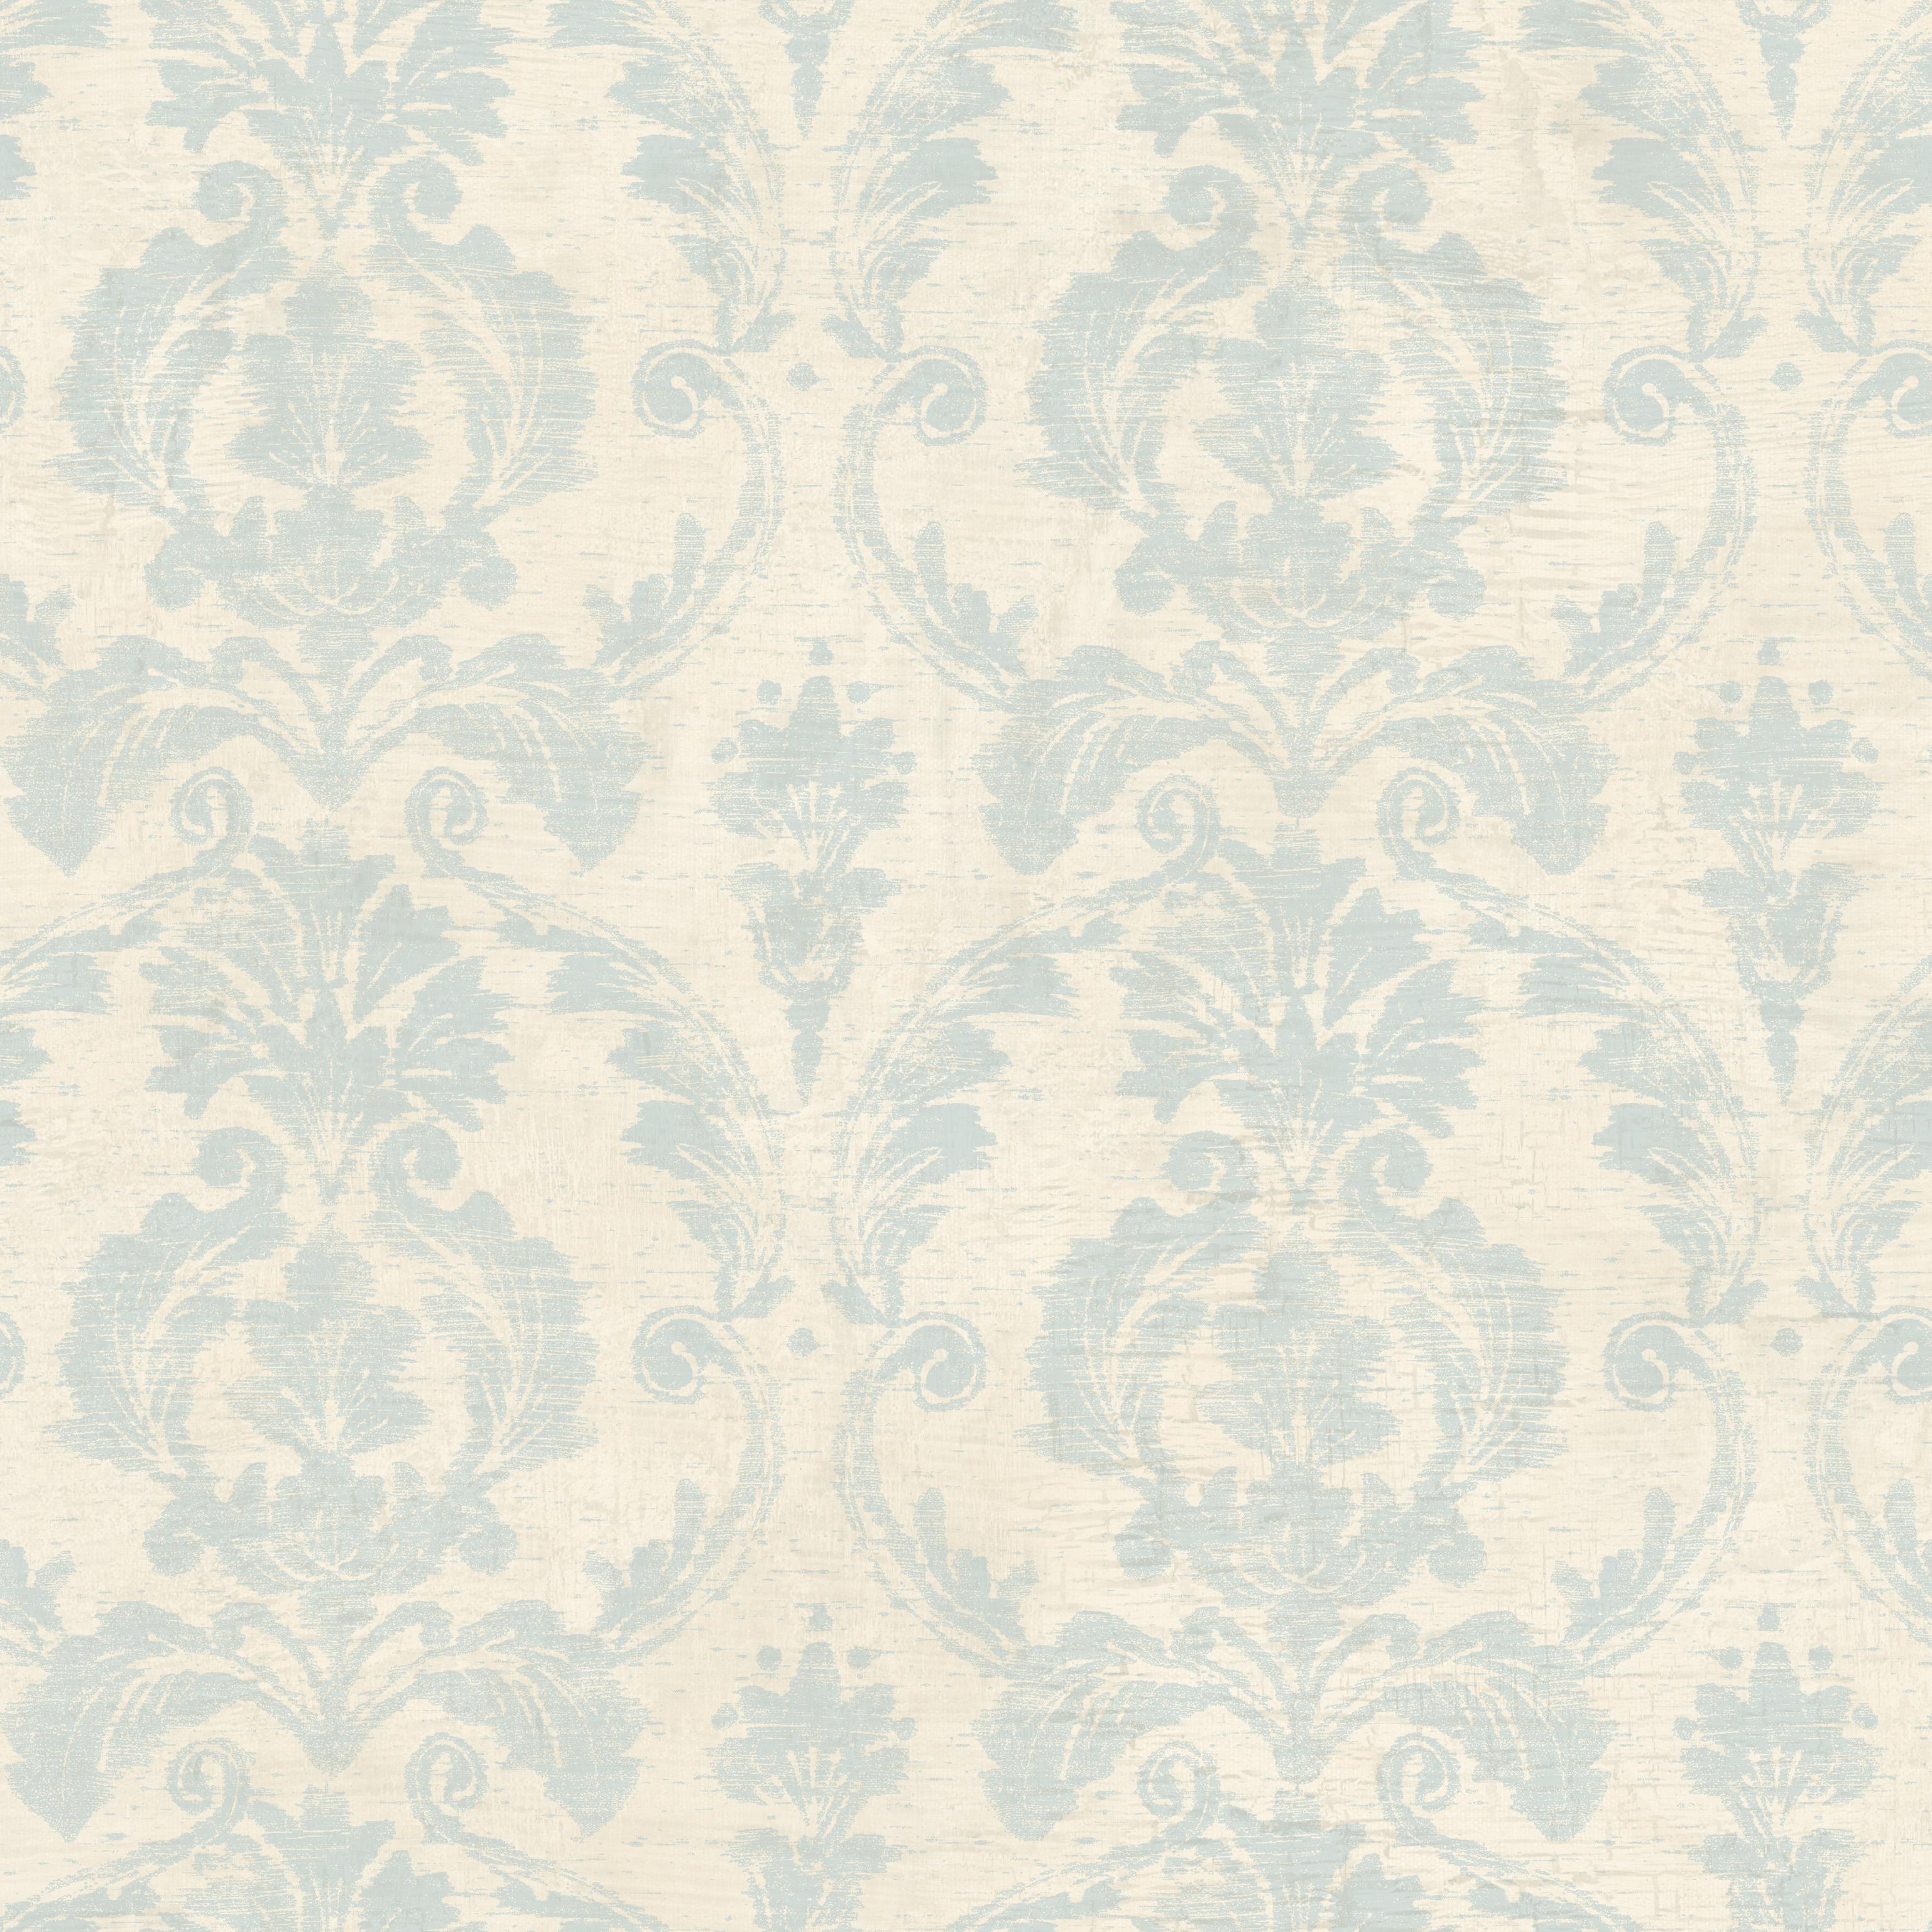 Picture of Bristol Blue Torch Damask Wallpaper Wallpaper